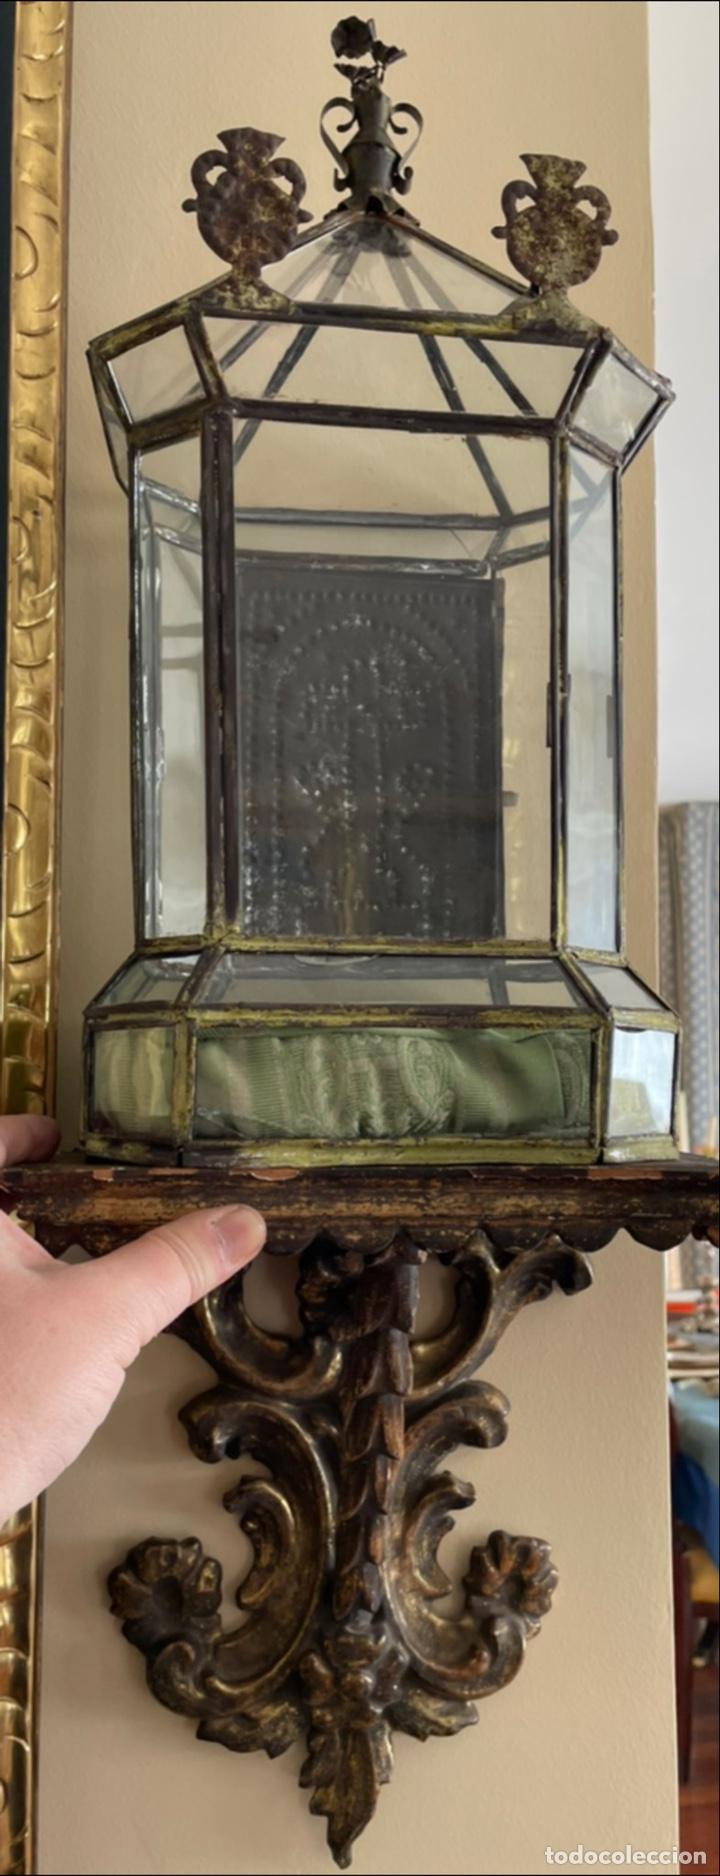 Antigüedades: Espectacular Urna sobre su mensula del siglo XVIII - Foto 2 - 235940945